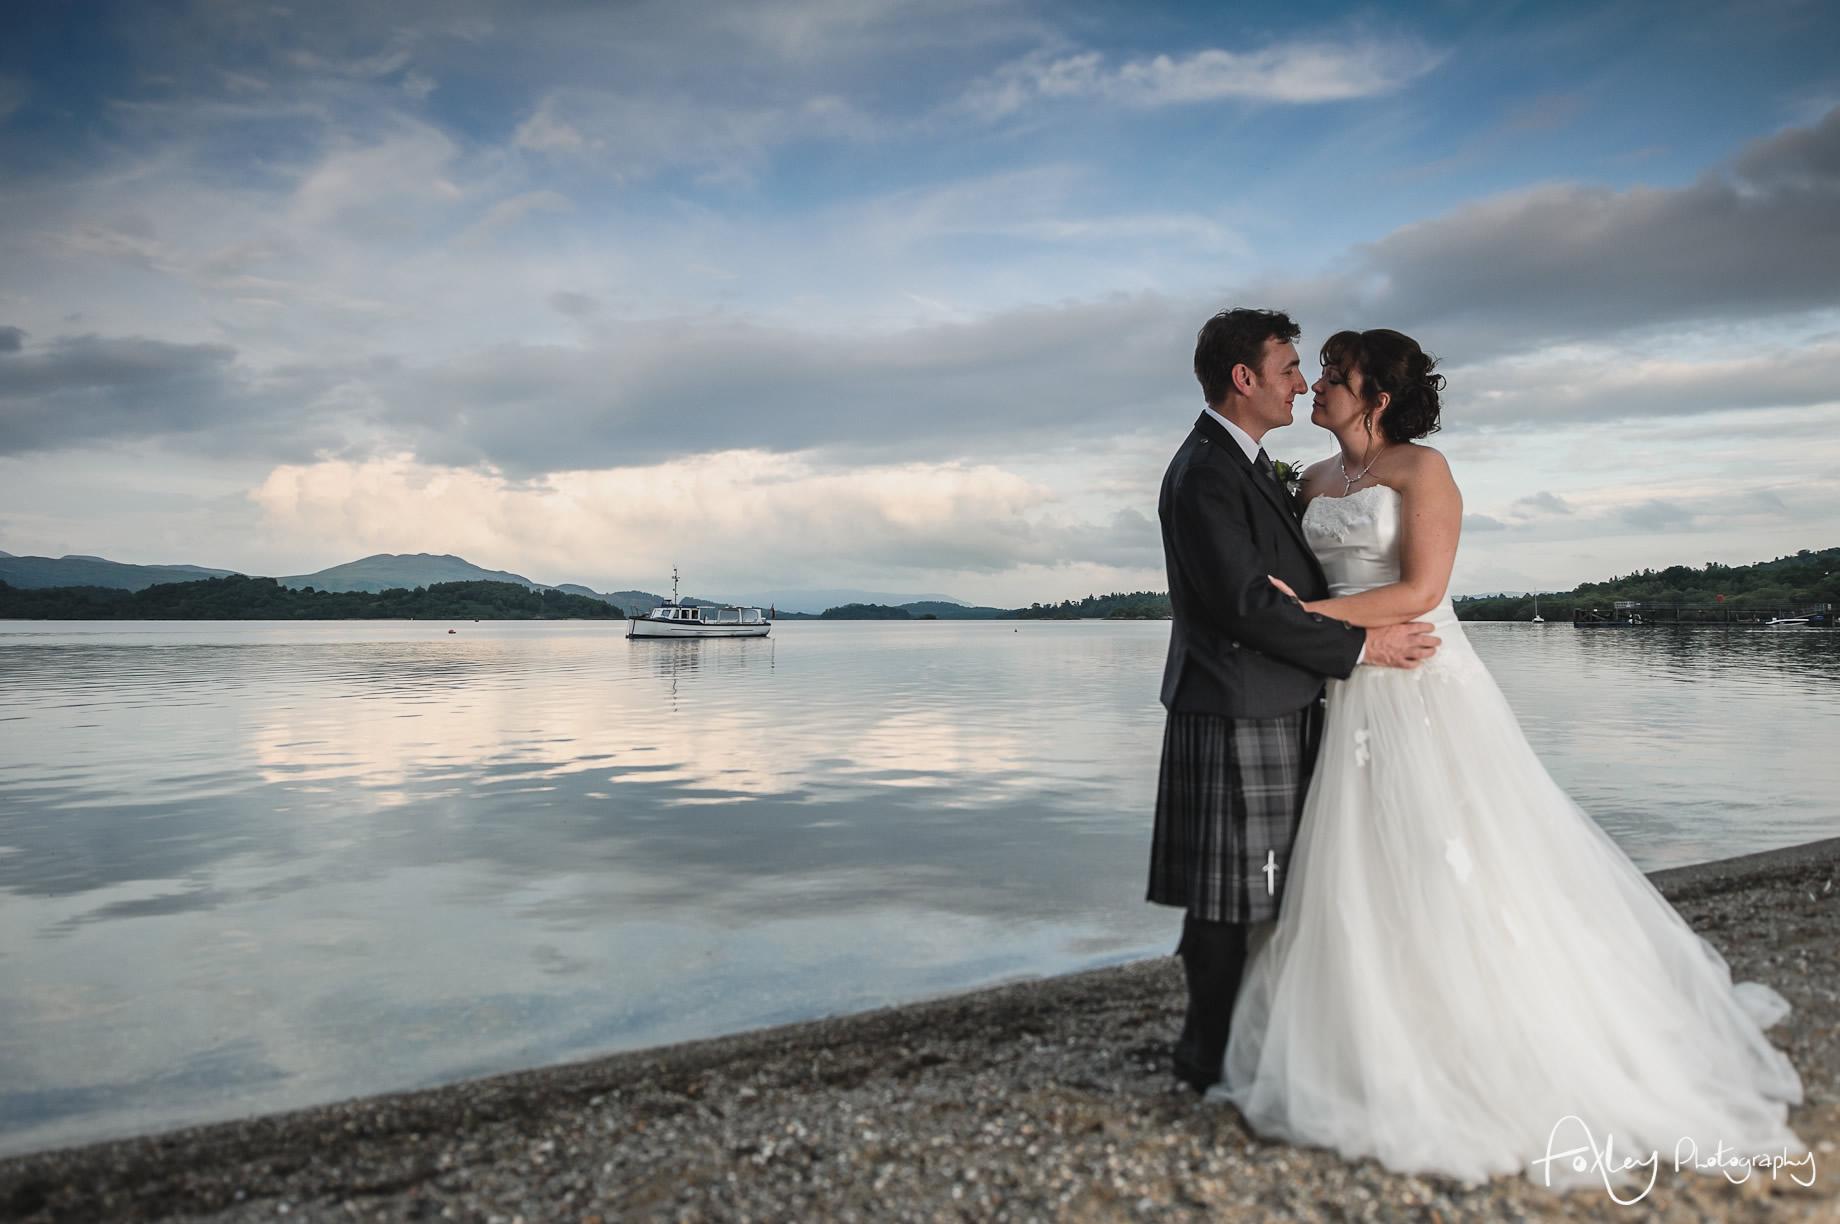 Alys-And-Davids-Wedding-Loch-Lomond-159